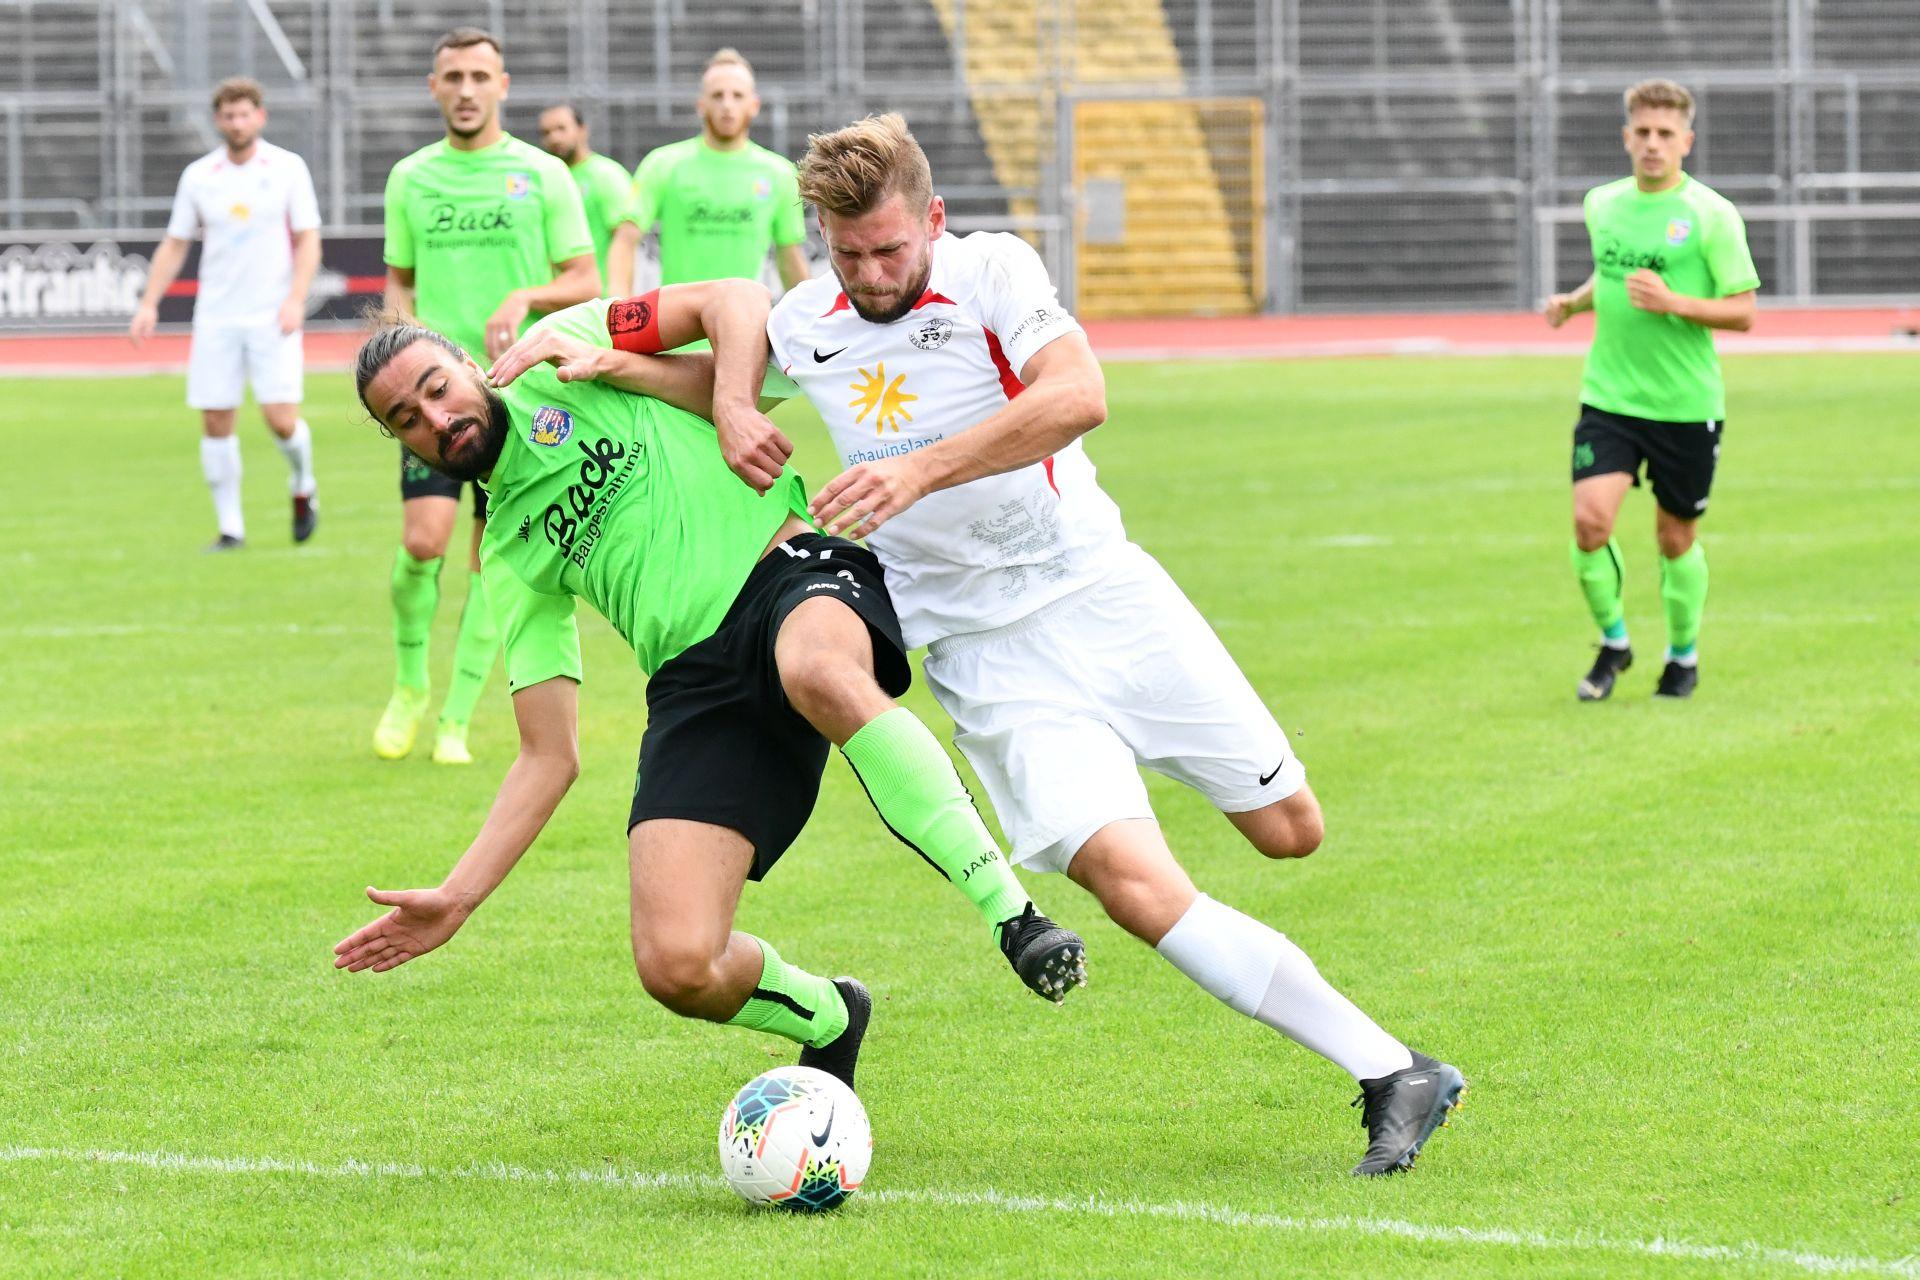 Lotto Hessenliga 2019/2020, KSV Hessen Kassel, TSV Eintracht Stadtallendorf, Endstand 2:2, Sebastian Schmeer (KSV Hessen Kassel)